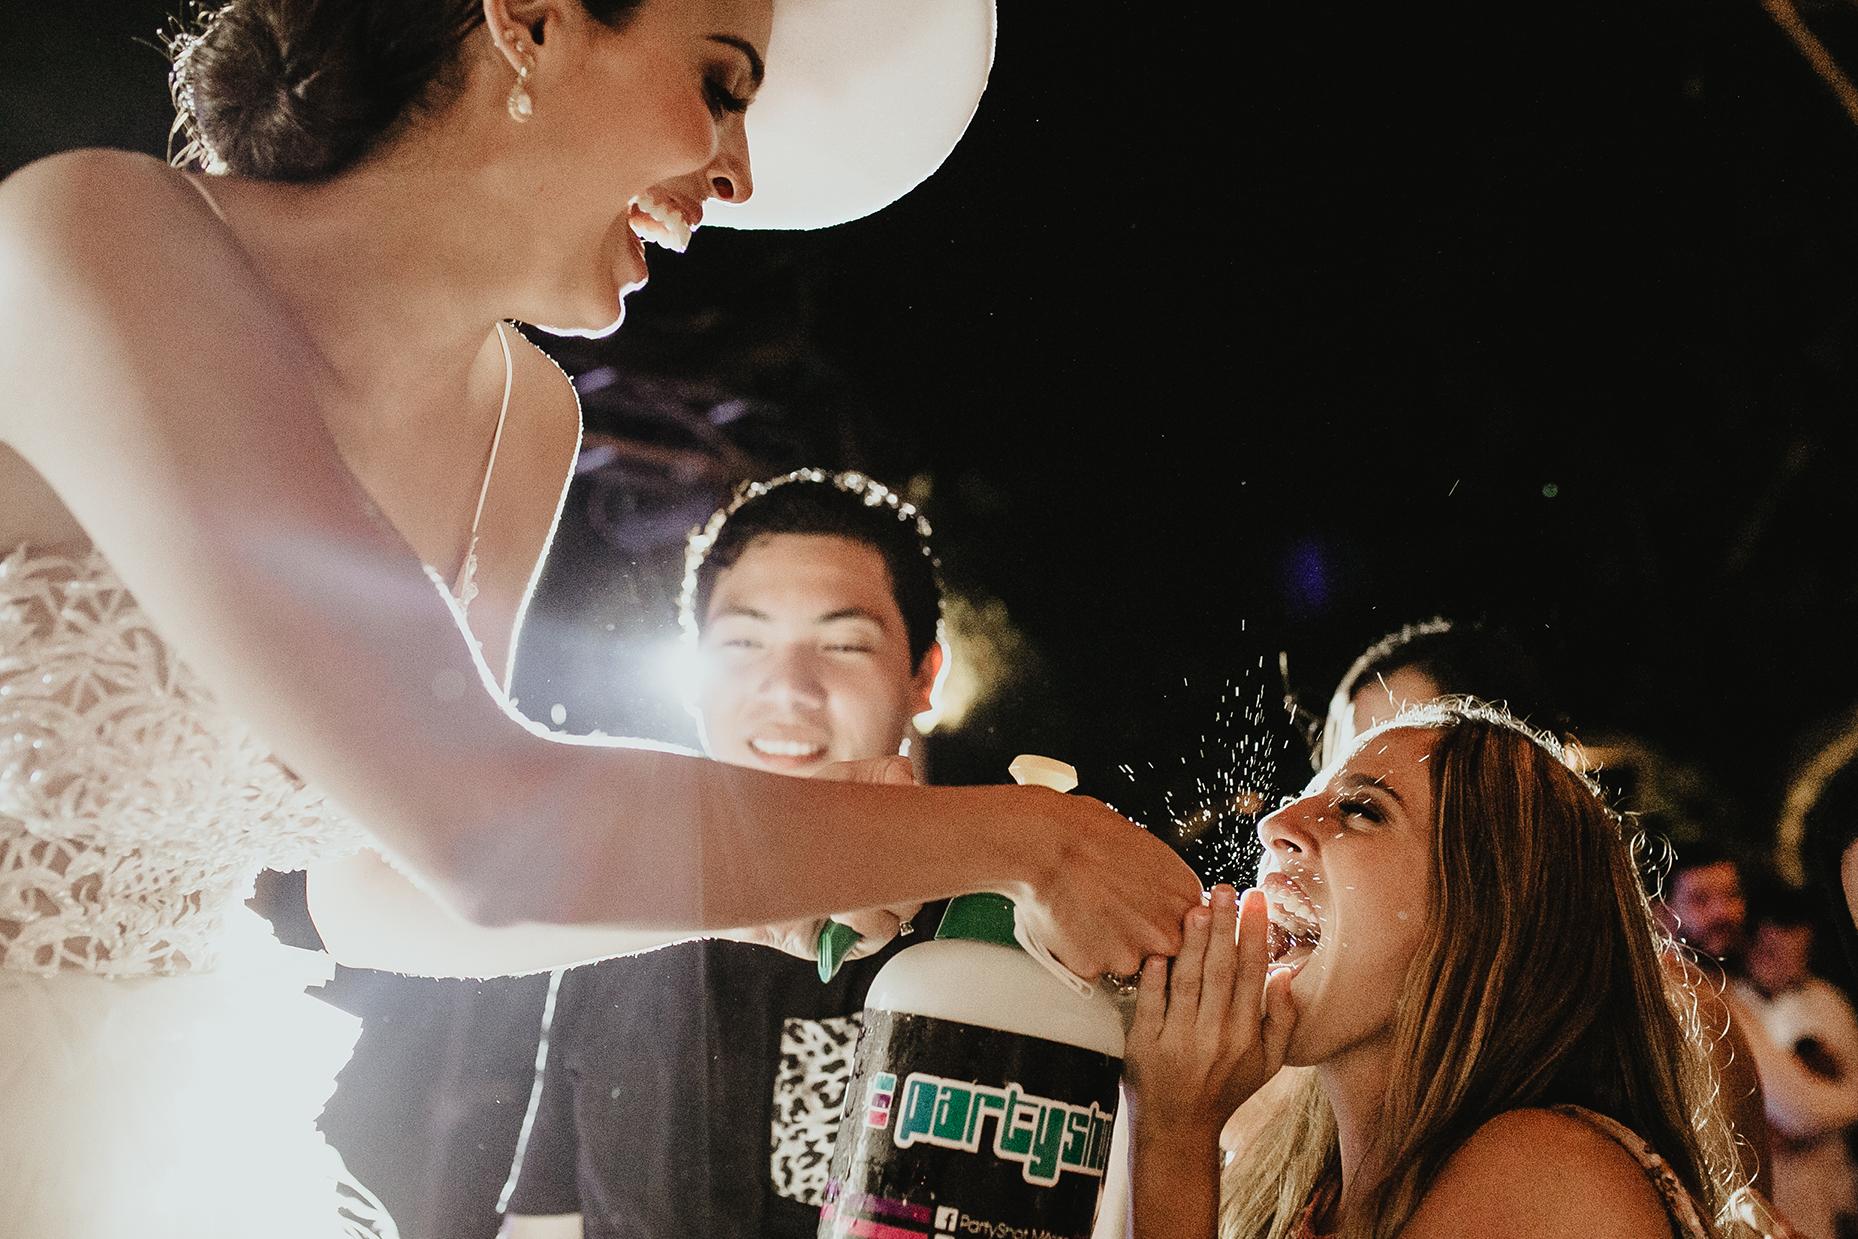 1327R&F__WeddingDestination_Weddingmerida_BodaMexico_FotografoDeBodas_FabrizioSimoneenFotografo.jpg